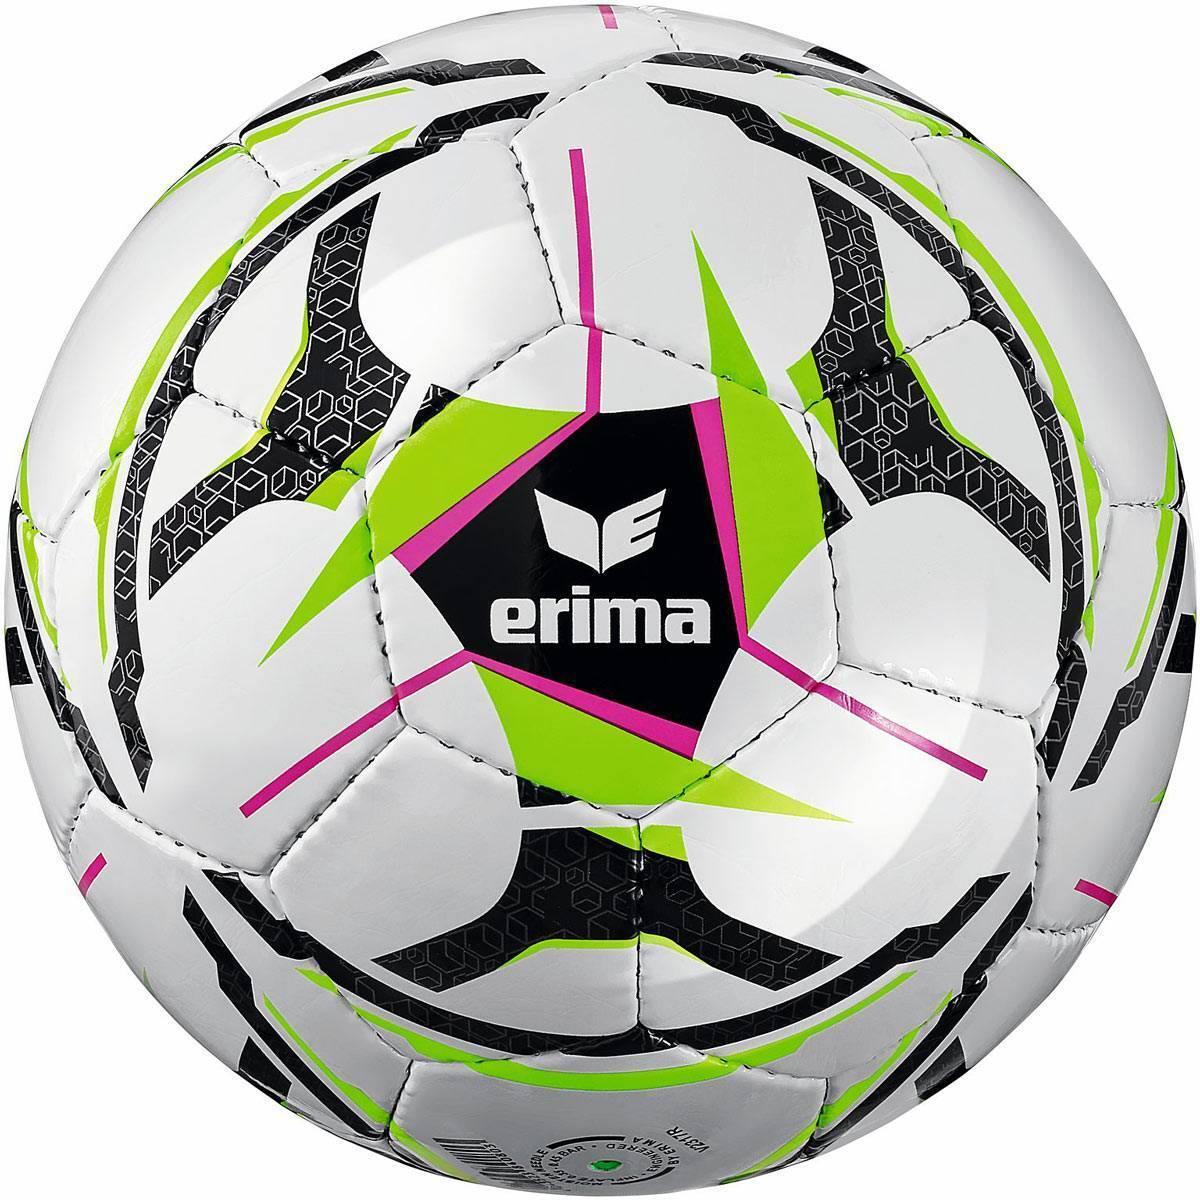 Erima 10er Ballpaket Senzor Allround Lite 350 Gramm Größe 5 Fußball Kinder NEU    Verrückter Preis, Birmingham